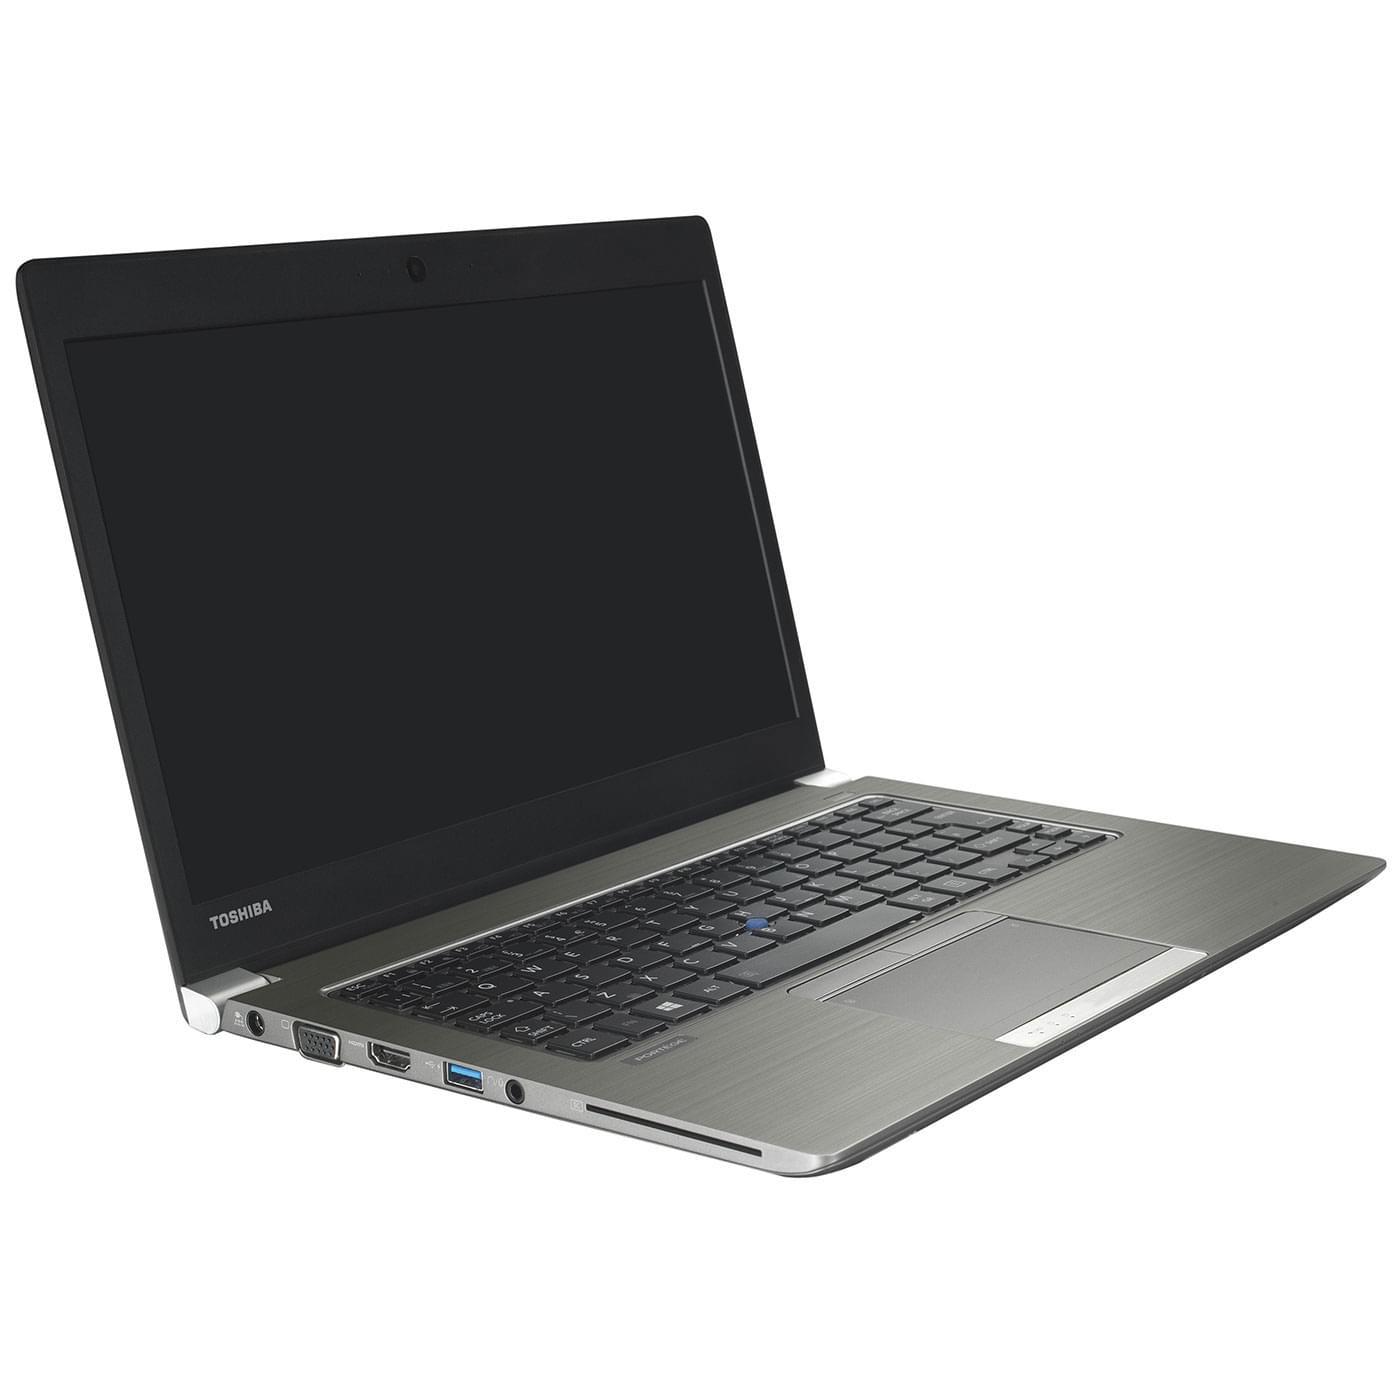 Toshiba PT253E-00M017FR - PC portable Toshiba - Cybertek.fr - 0